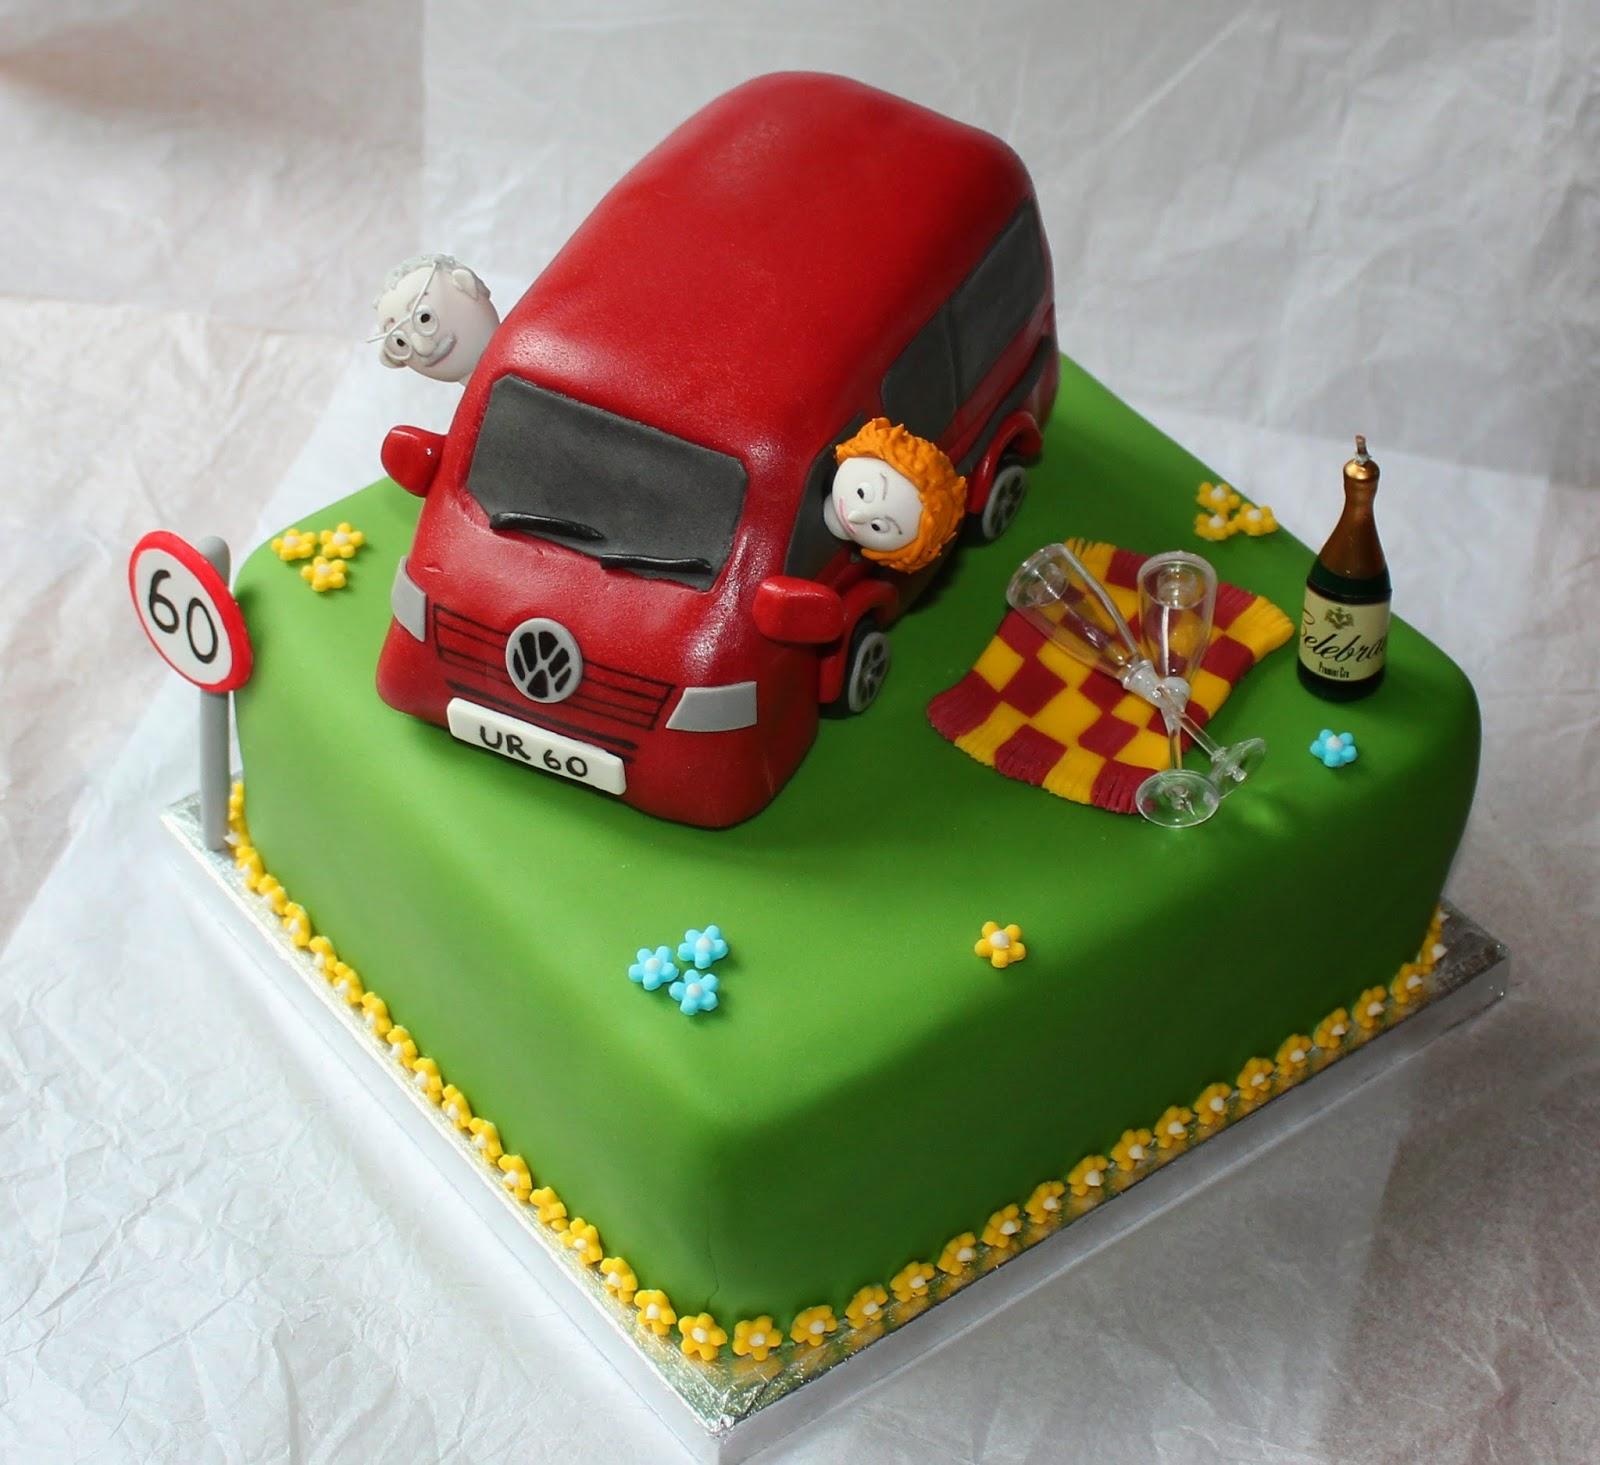 Cake Decorating Course Shrewsbury